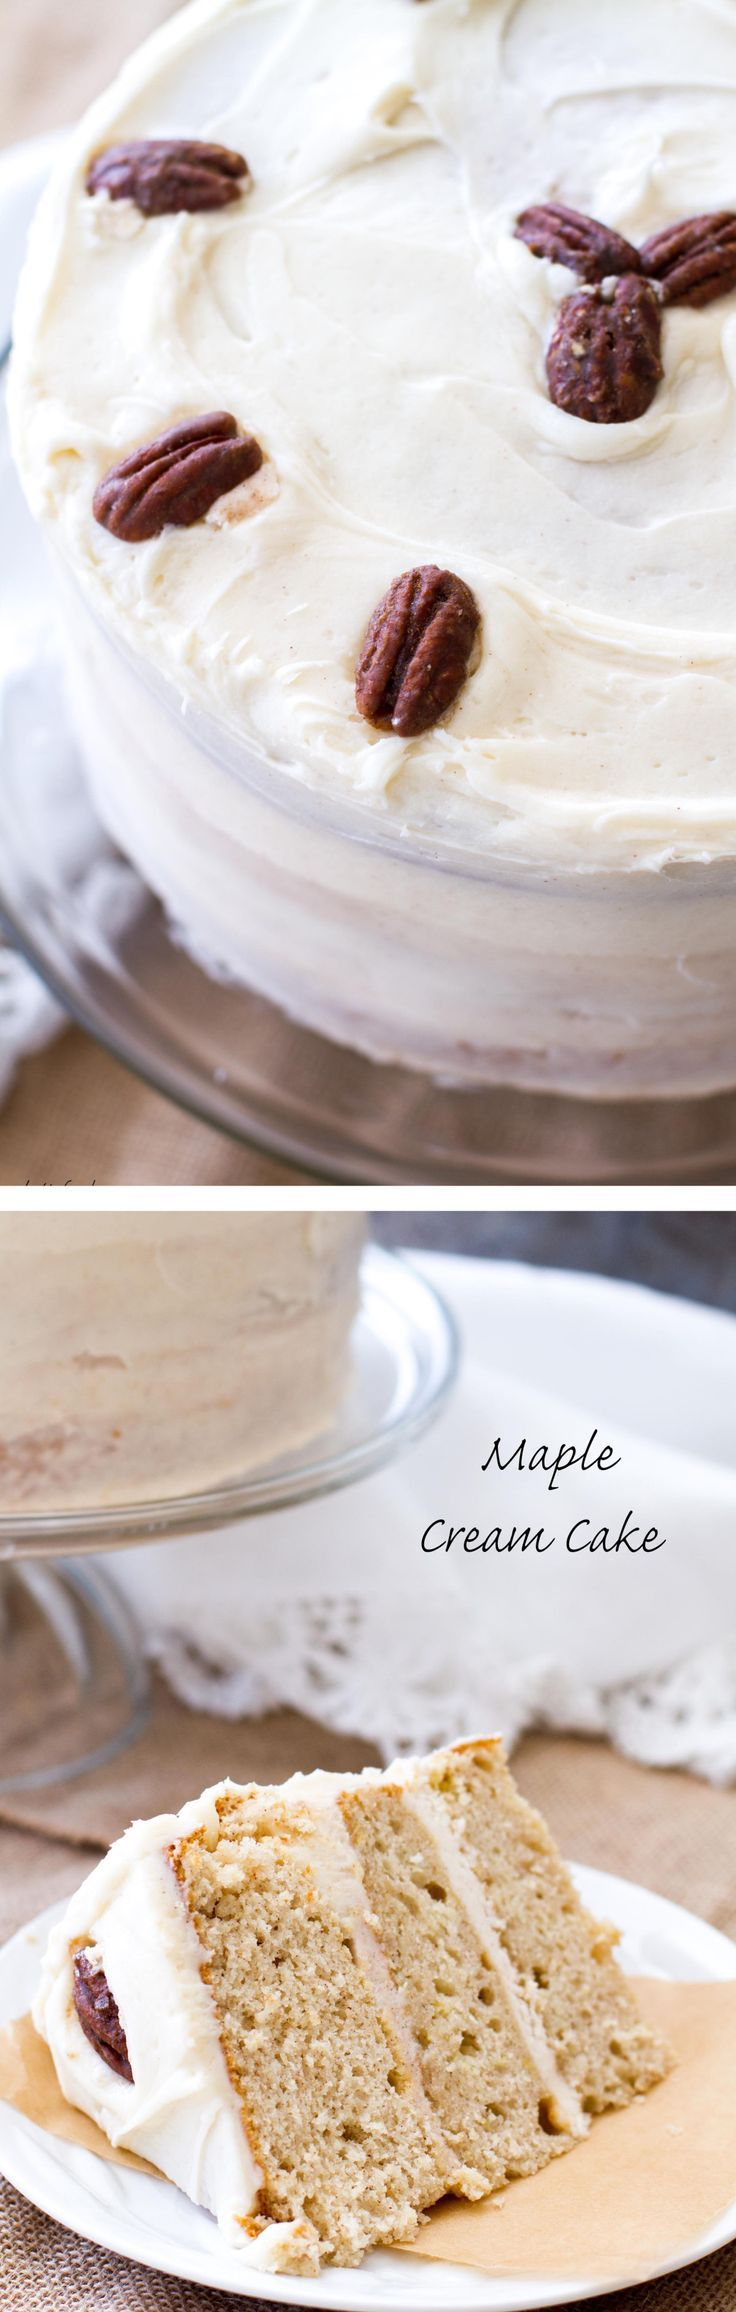 how to make maple cream sauce